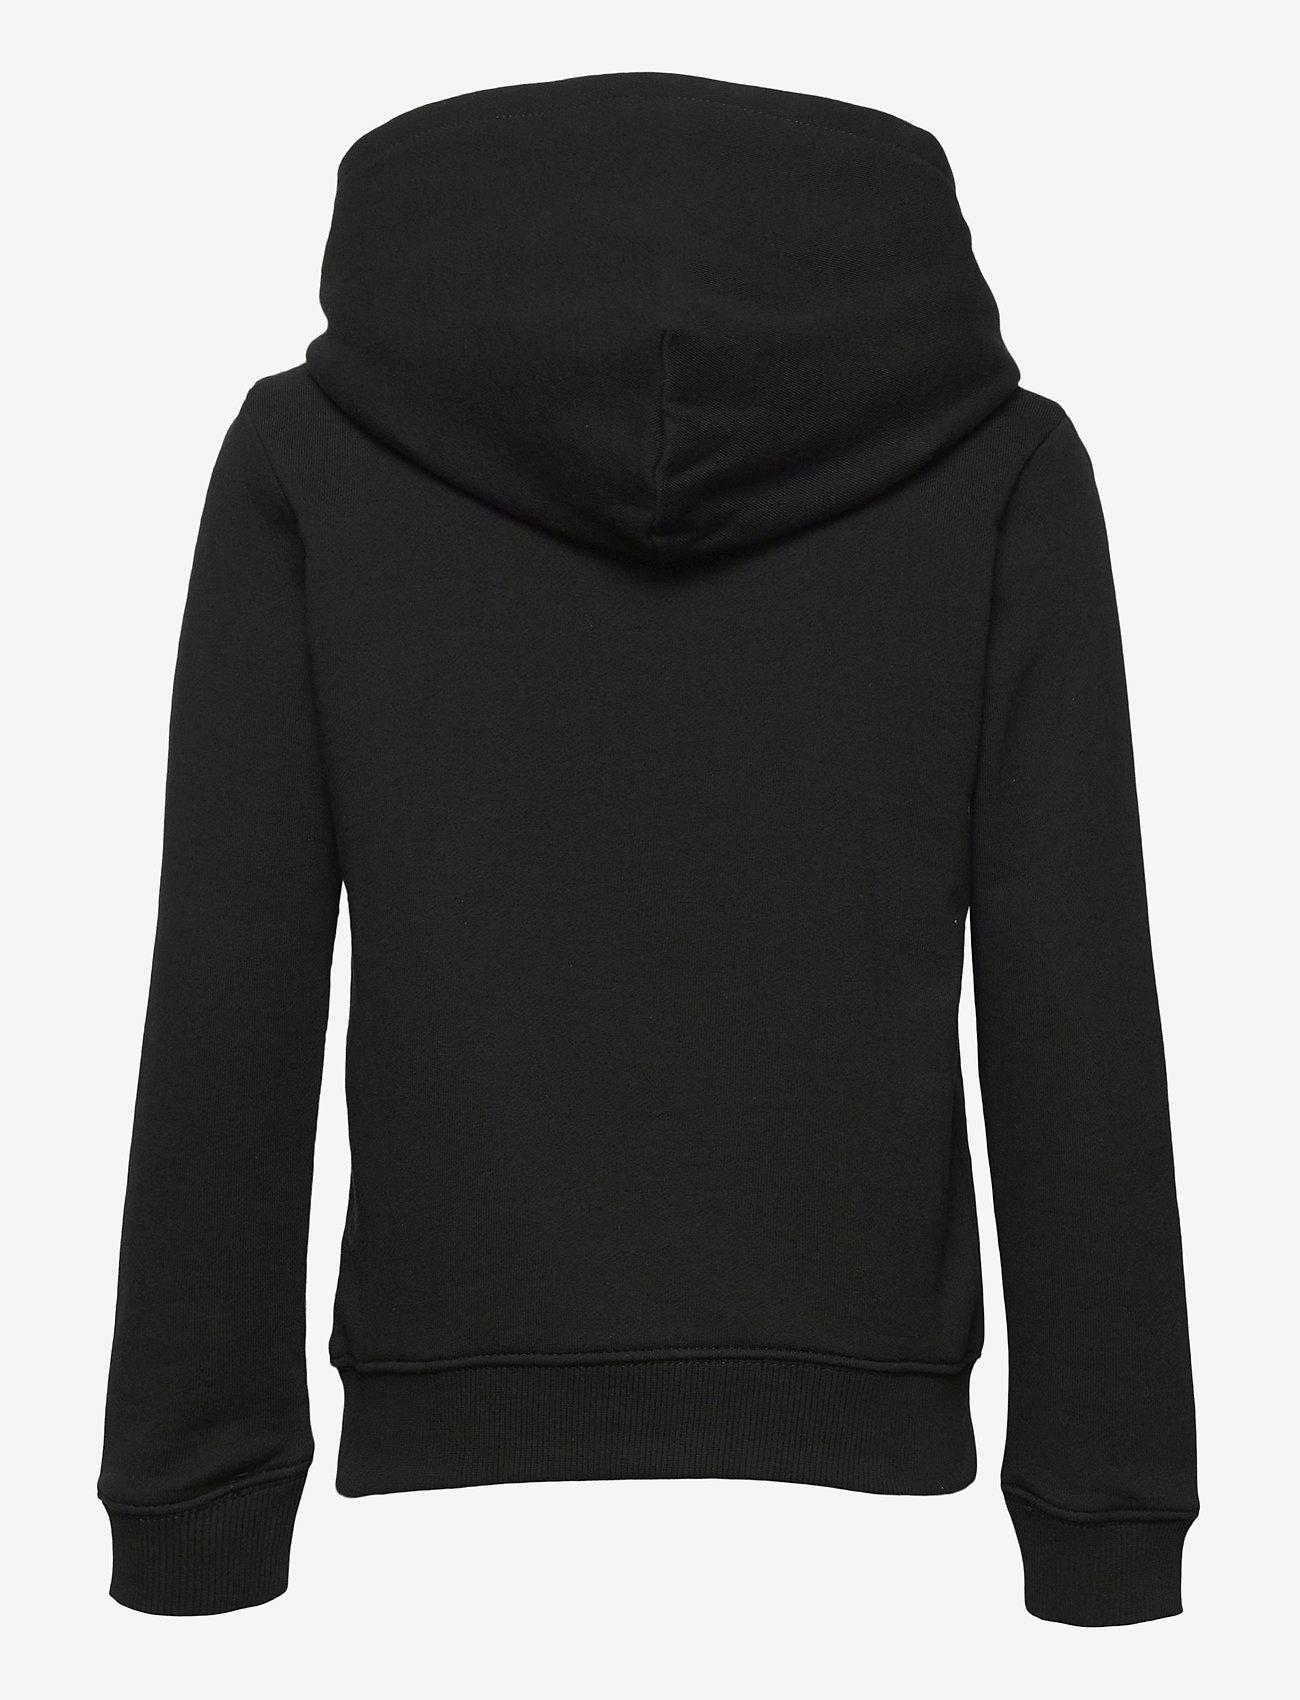 Calvin Klein - HYBRID LOGO HOODIE - kapuzenpullover - ck black - 1